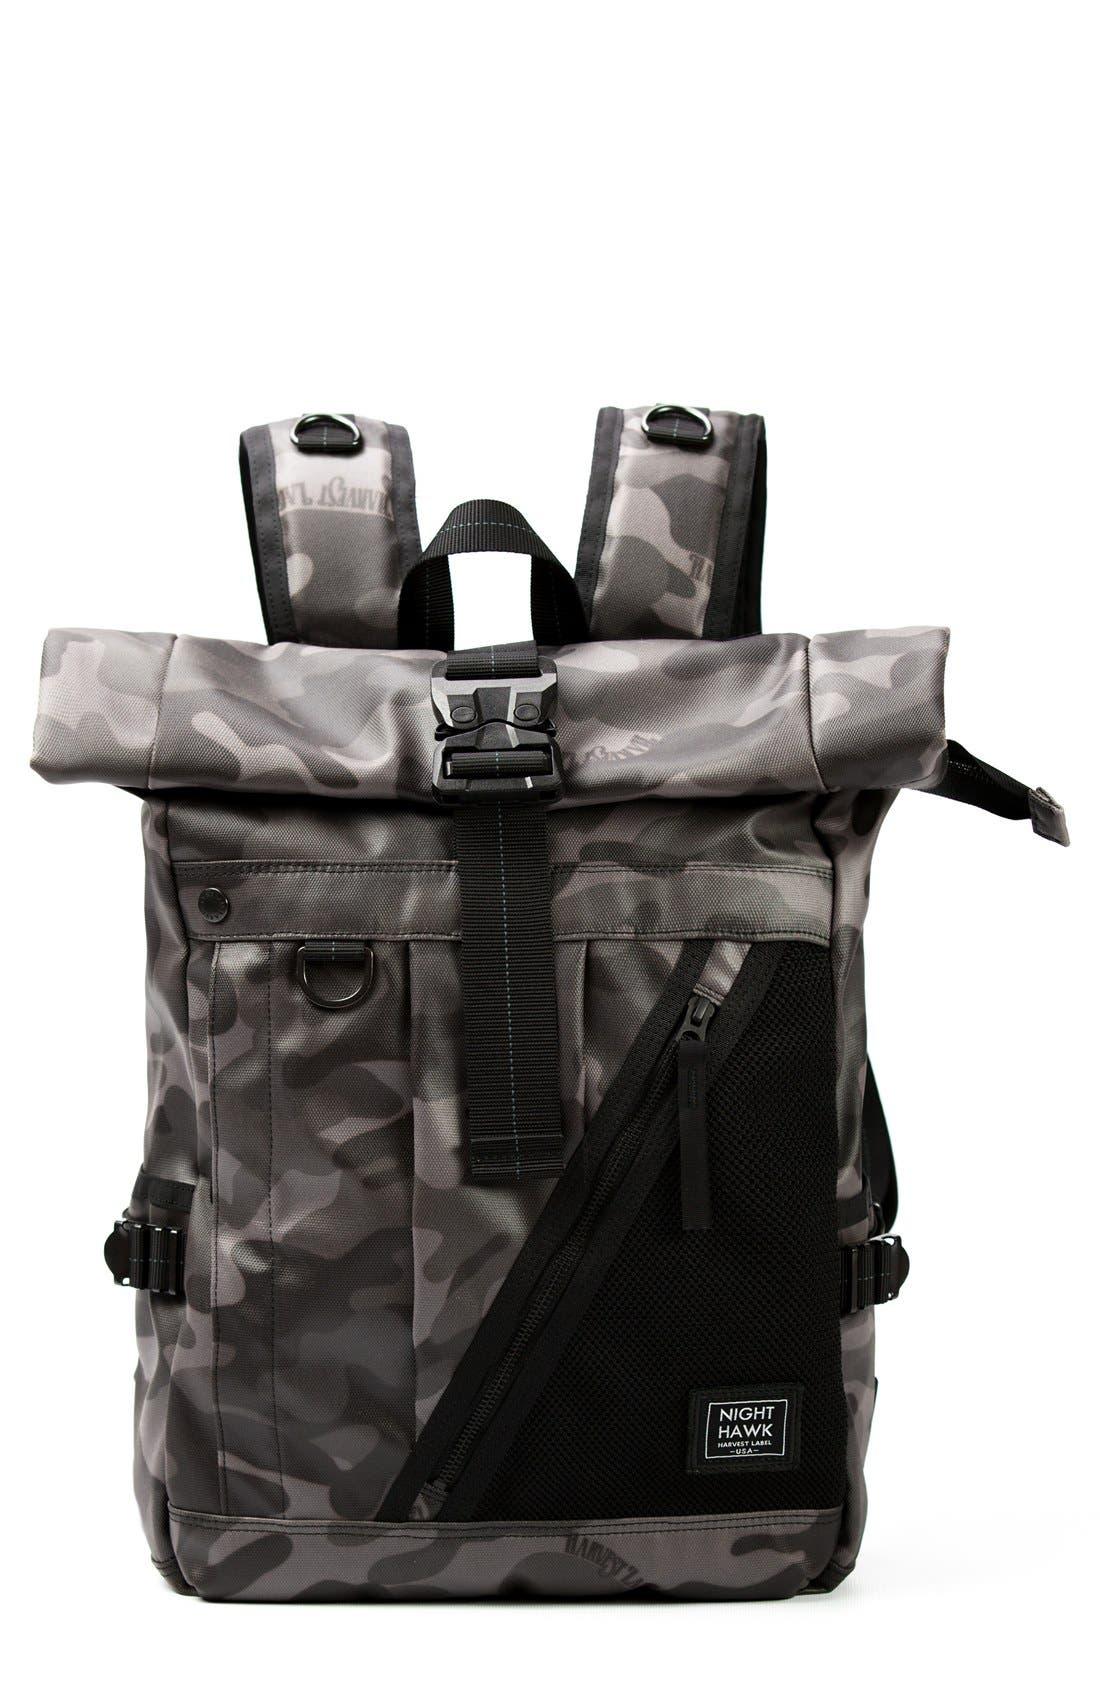 Harvest Label NightHawk Roll Top Backpack